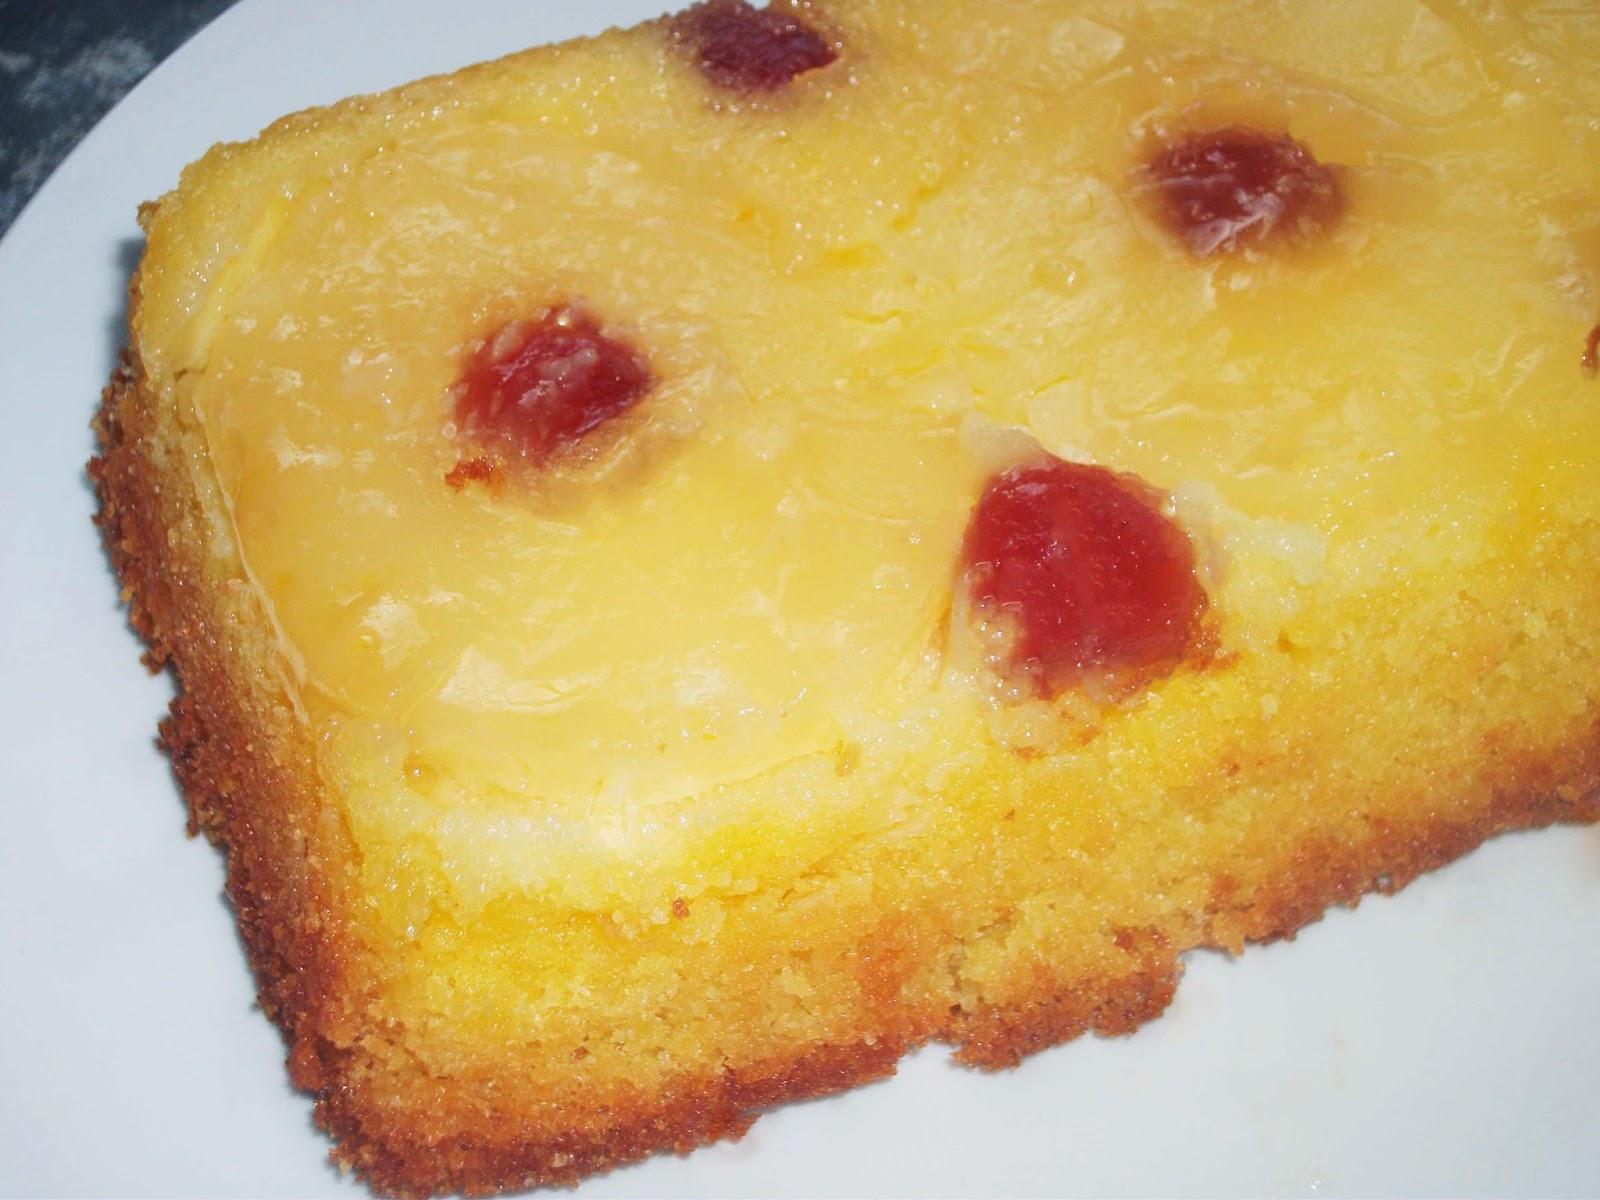 Gluten free Pineapple Upside-down Cake